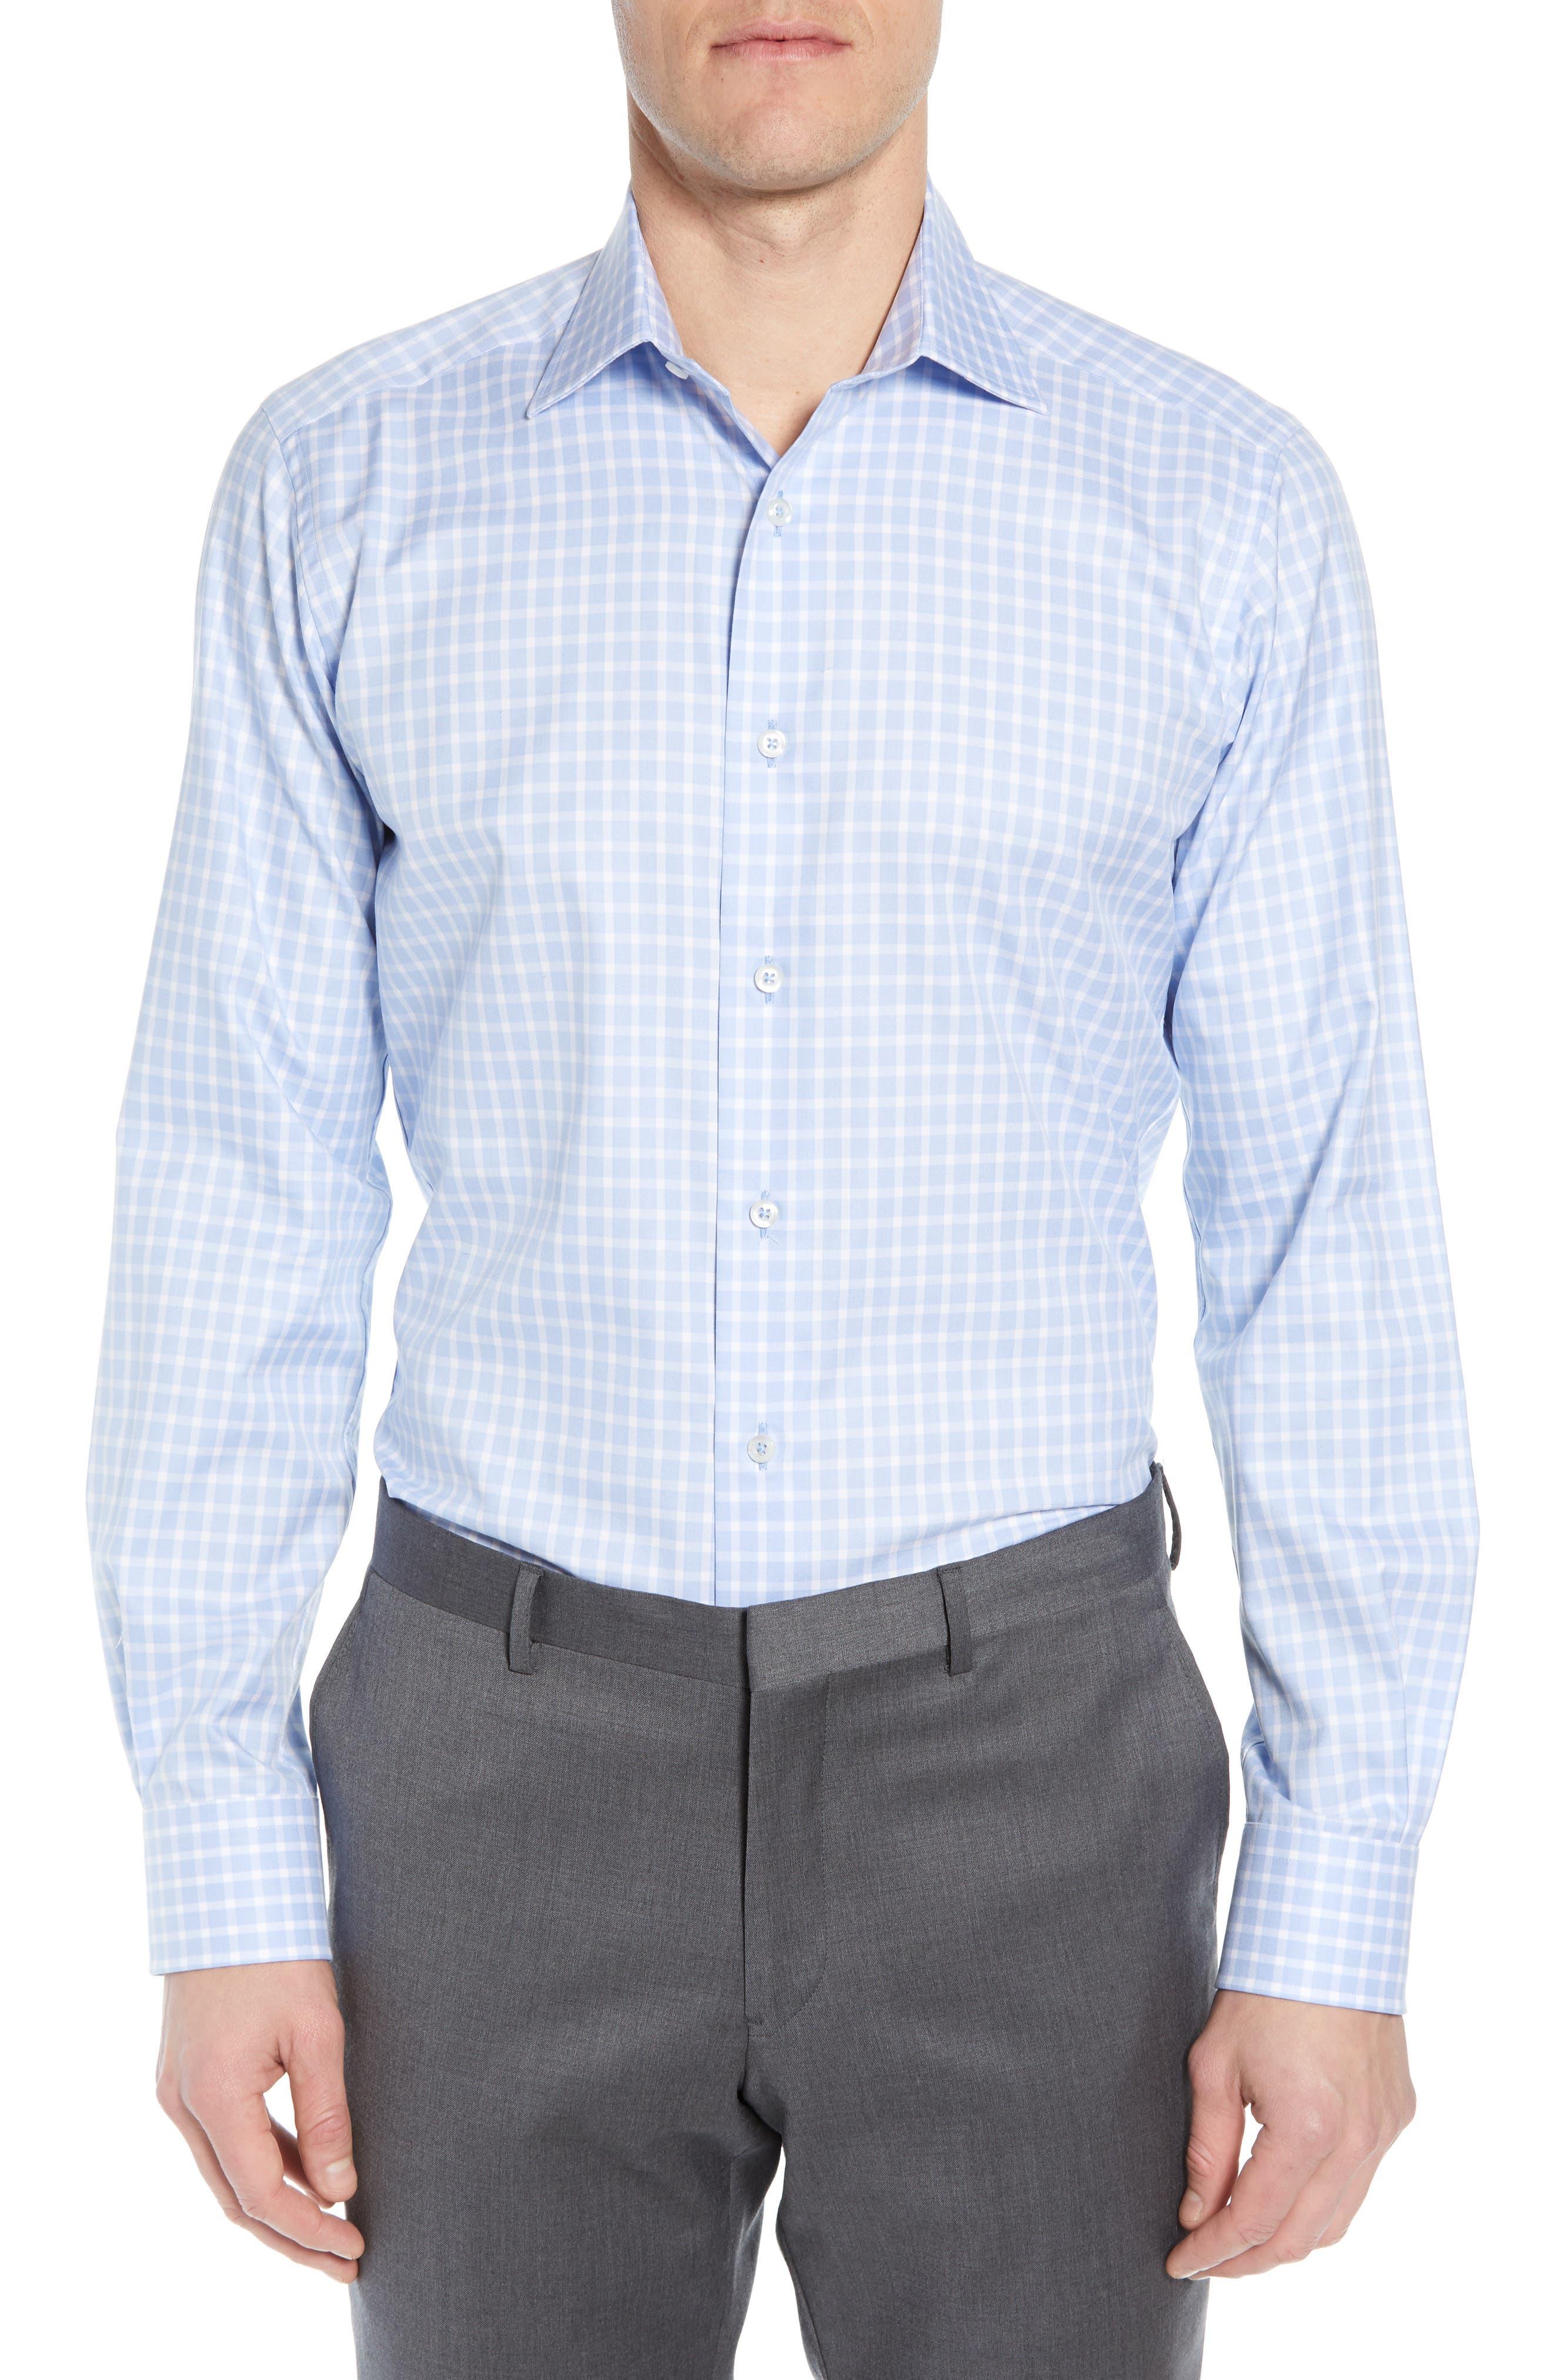 DAVID DONAHUE, Trim Fit Check Dress Shirt, Main thumbnail 1, color, BLUE